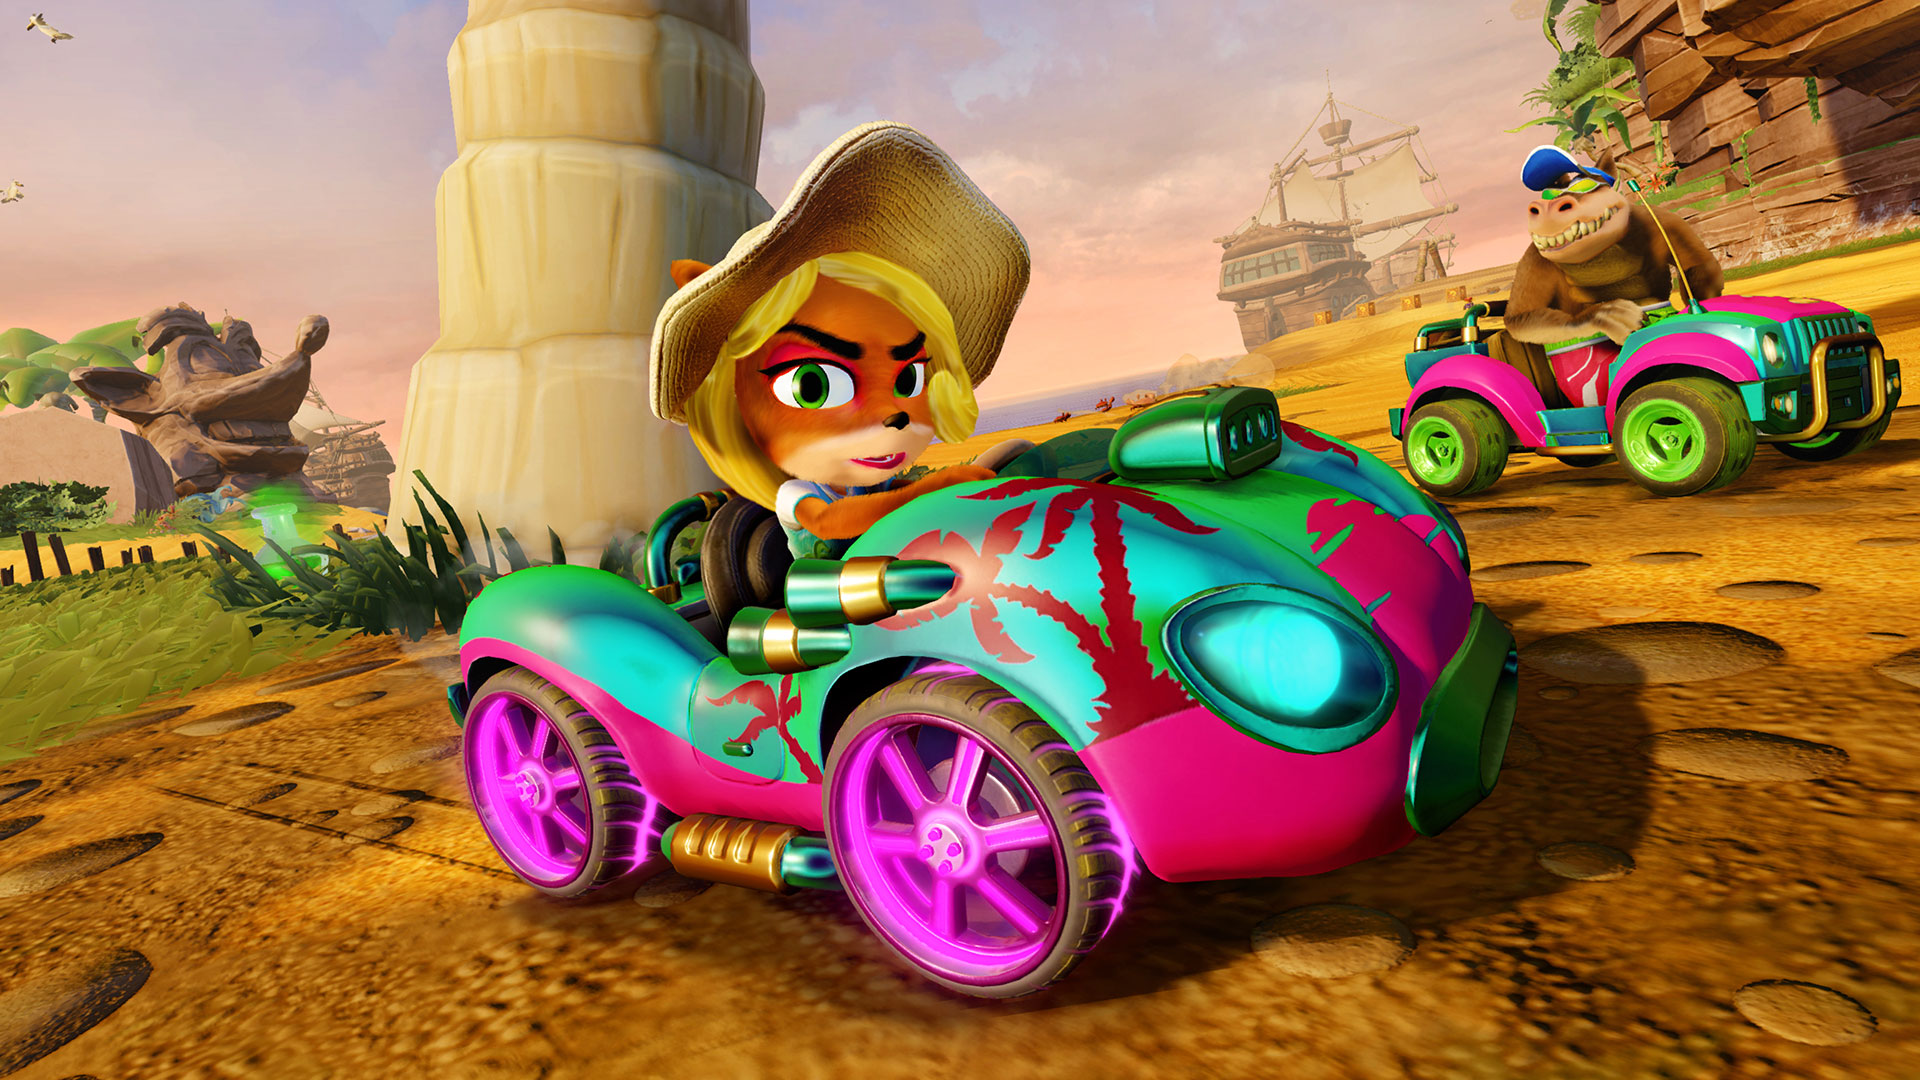 Daily news (May 10, Round 3): Crash Team Racing Nitro-Fueled / RPG